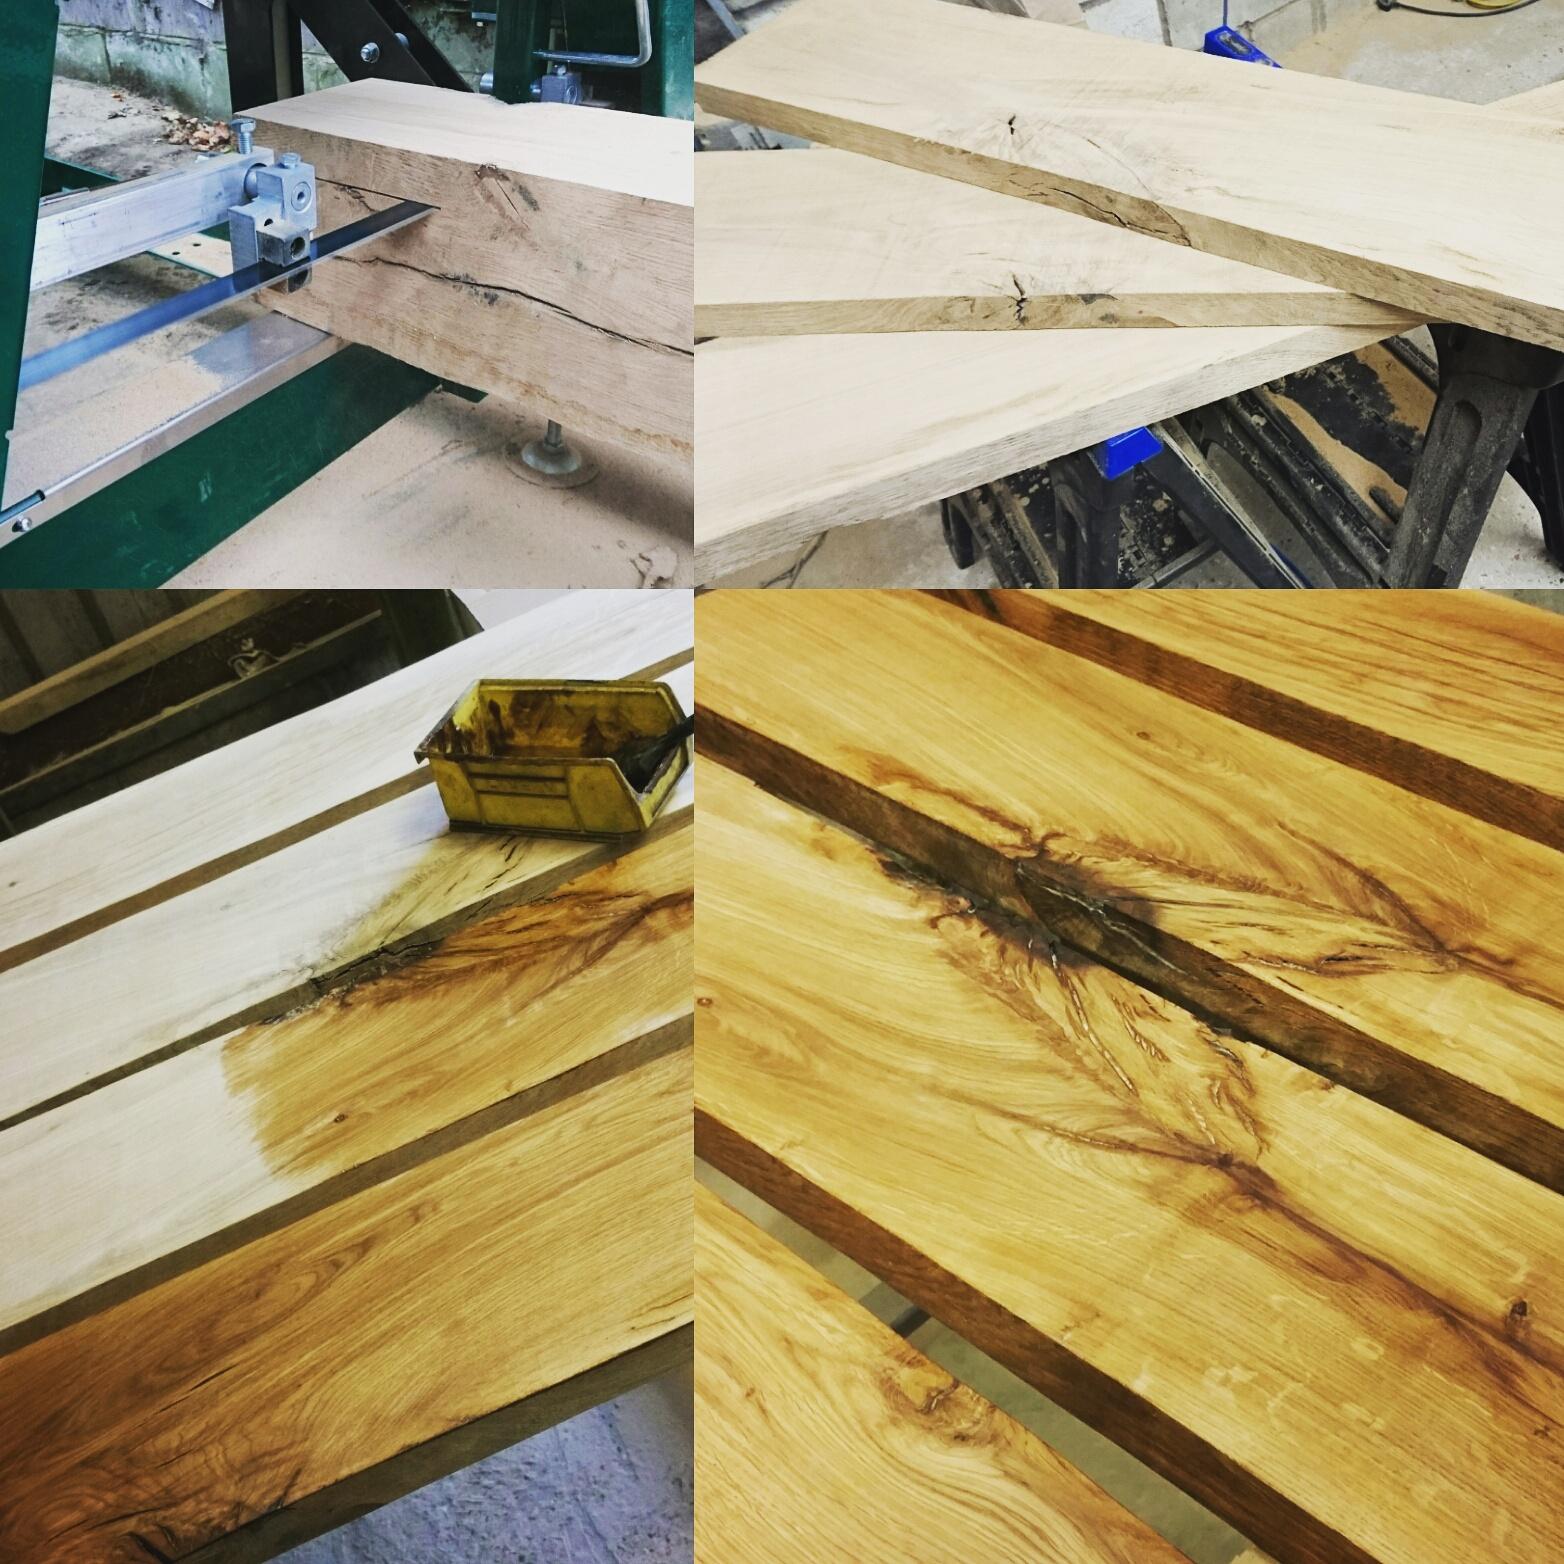 Oak shelves being cut, prepared and waxed